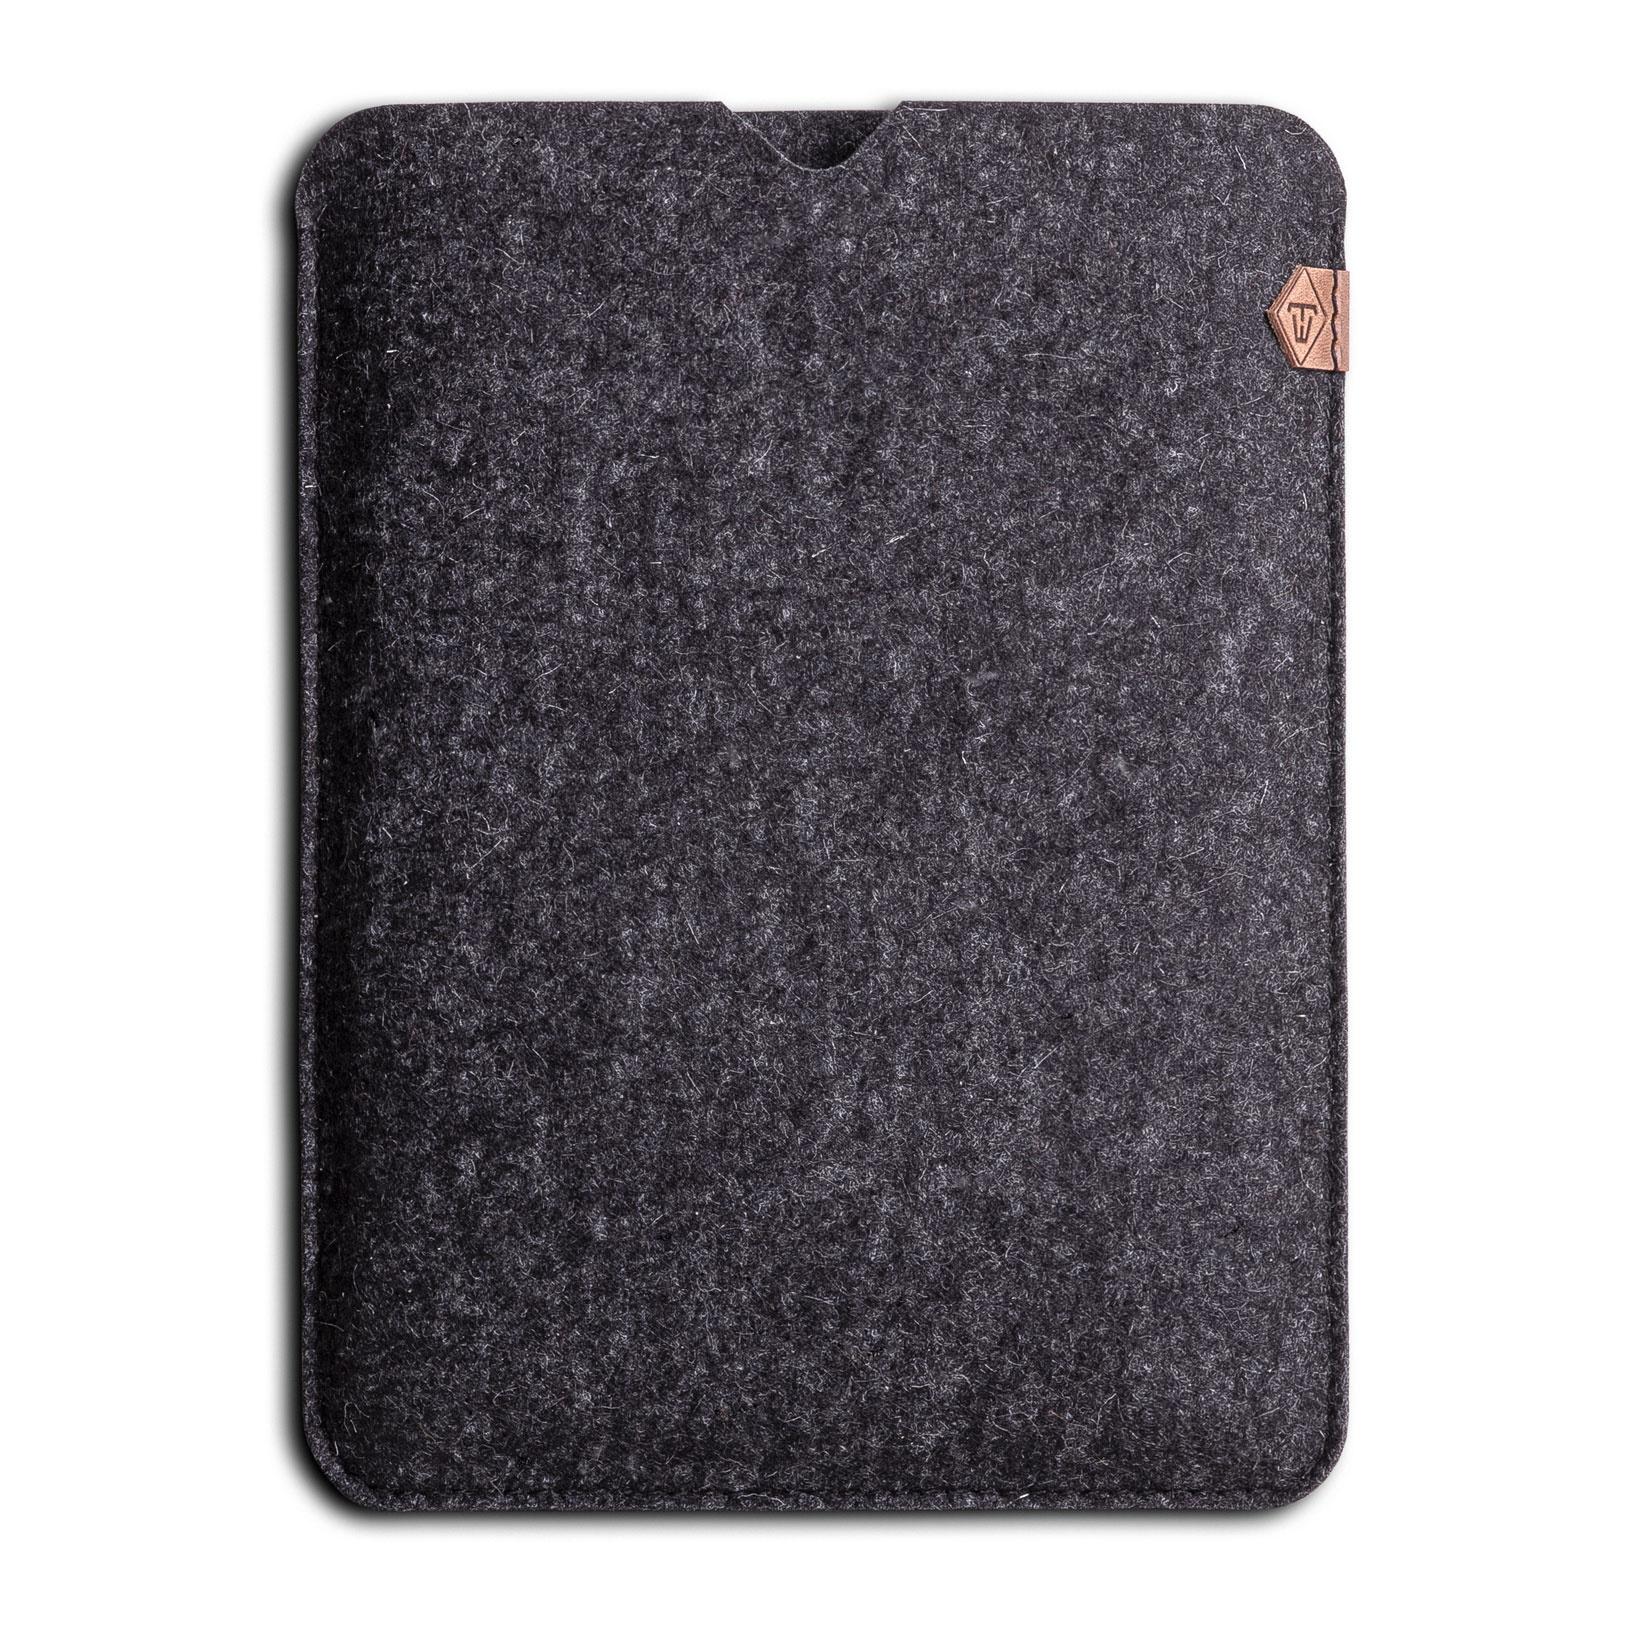 iPad Pro 11 12.9 Air 10.5 10.2 felt sleeve SOFTWERK